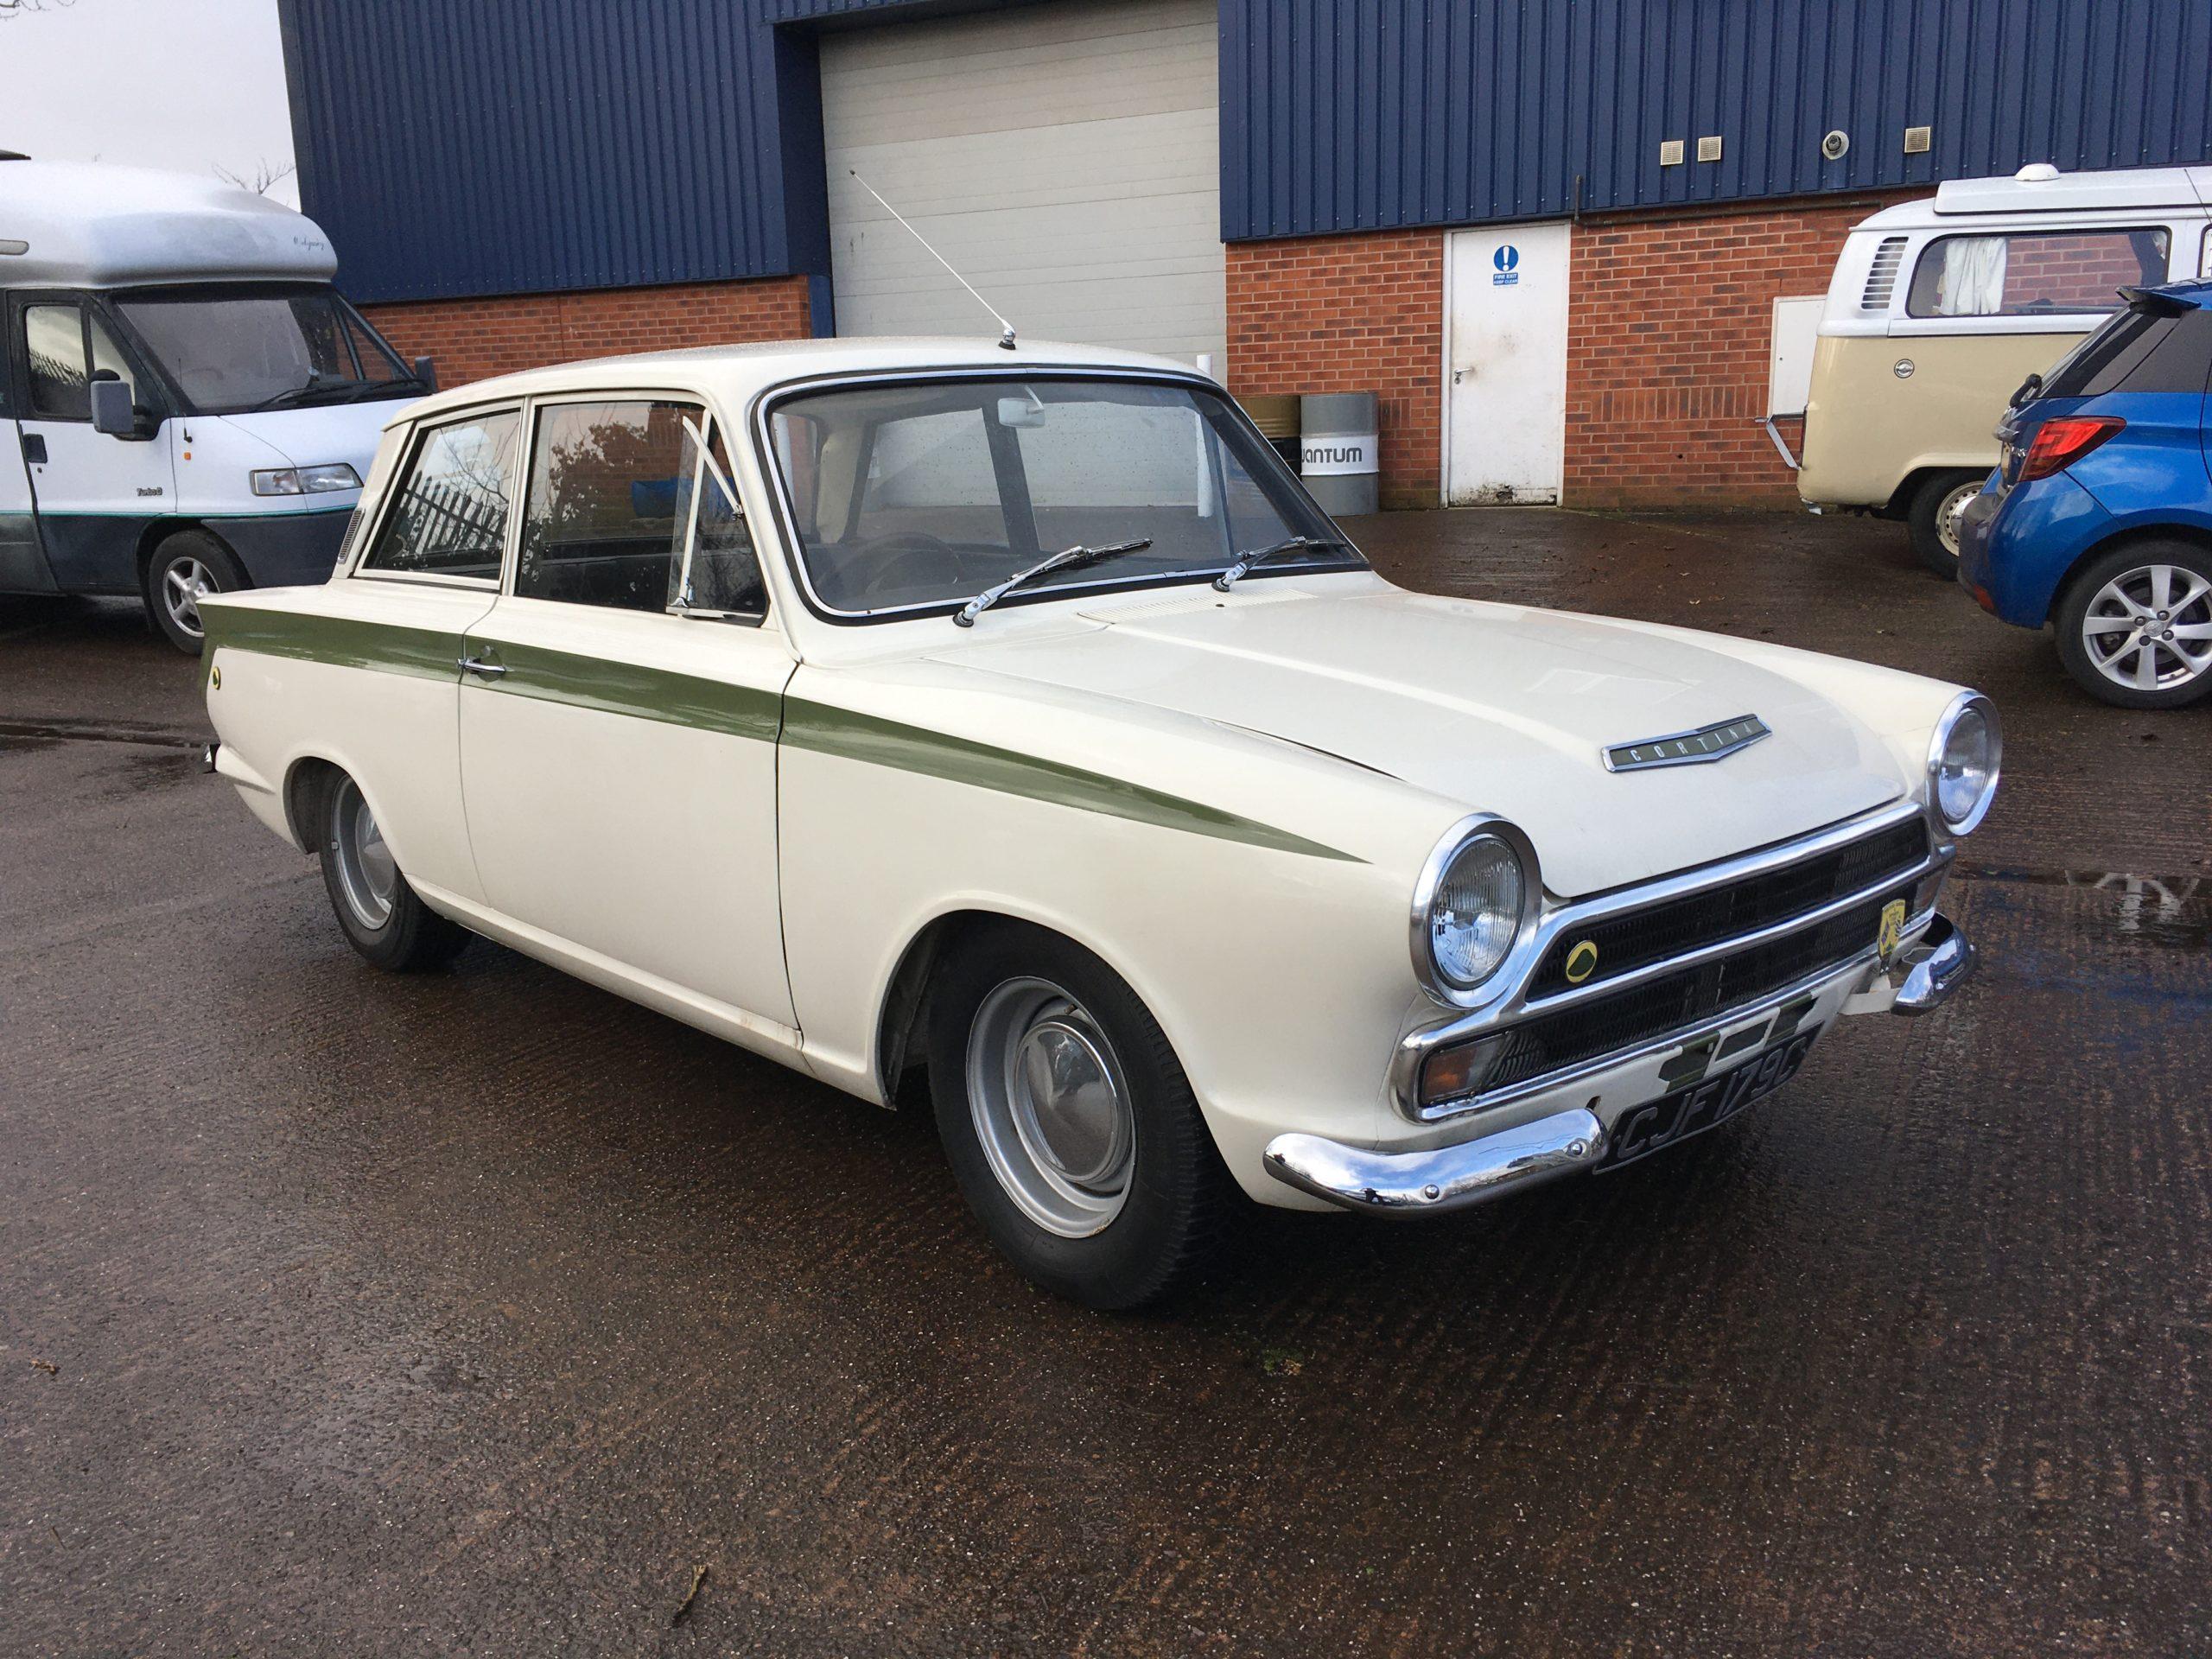 1965 Lotus Cortina Mk1, Original standard spec – SOLD